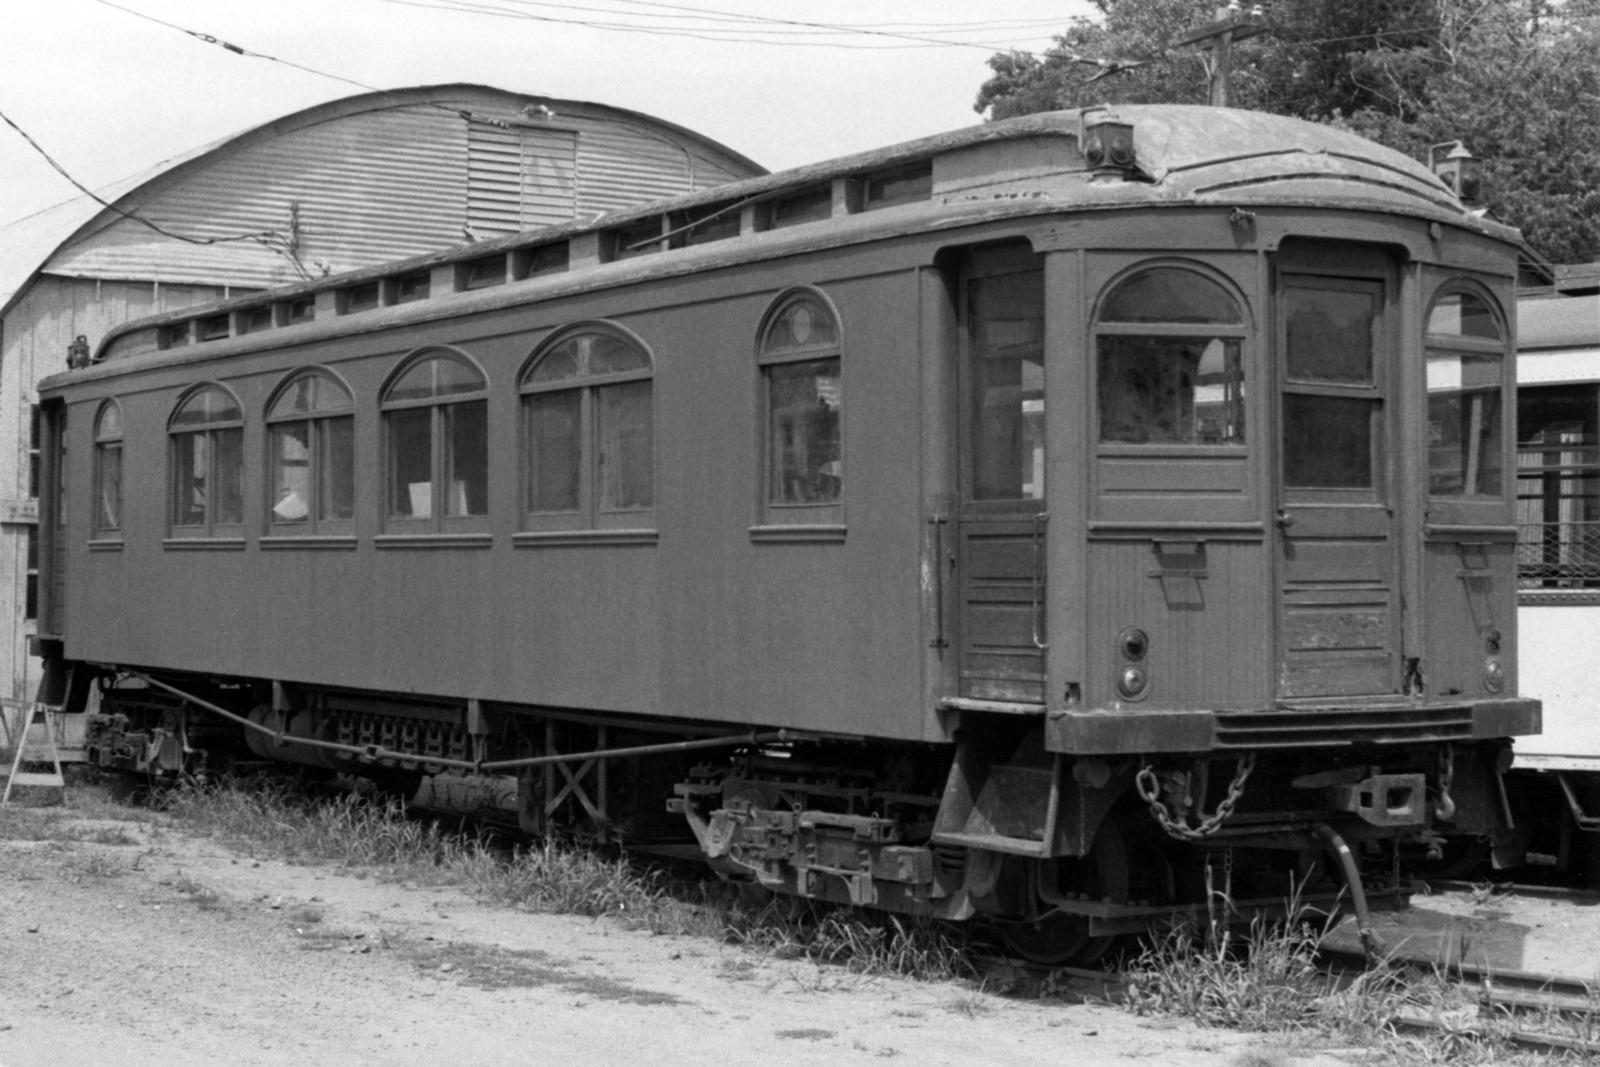 (85k, 710x575)<br><b>Country:</b> United States<br><b>City:</b> New York<br><b>System:</b> Long Island Rail Road<br><b>Line:</b> LIRR Long Island City<br><b>Location:</b> Long Island City <br><b>Car:</b> R-32 (Budd, 1964)  3497 <br><b>Collection of:</b> Sanford Gardner<br><b>Viewed (this week/total):</b> 0 / 5973